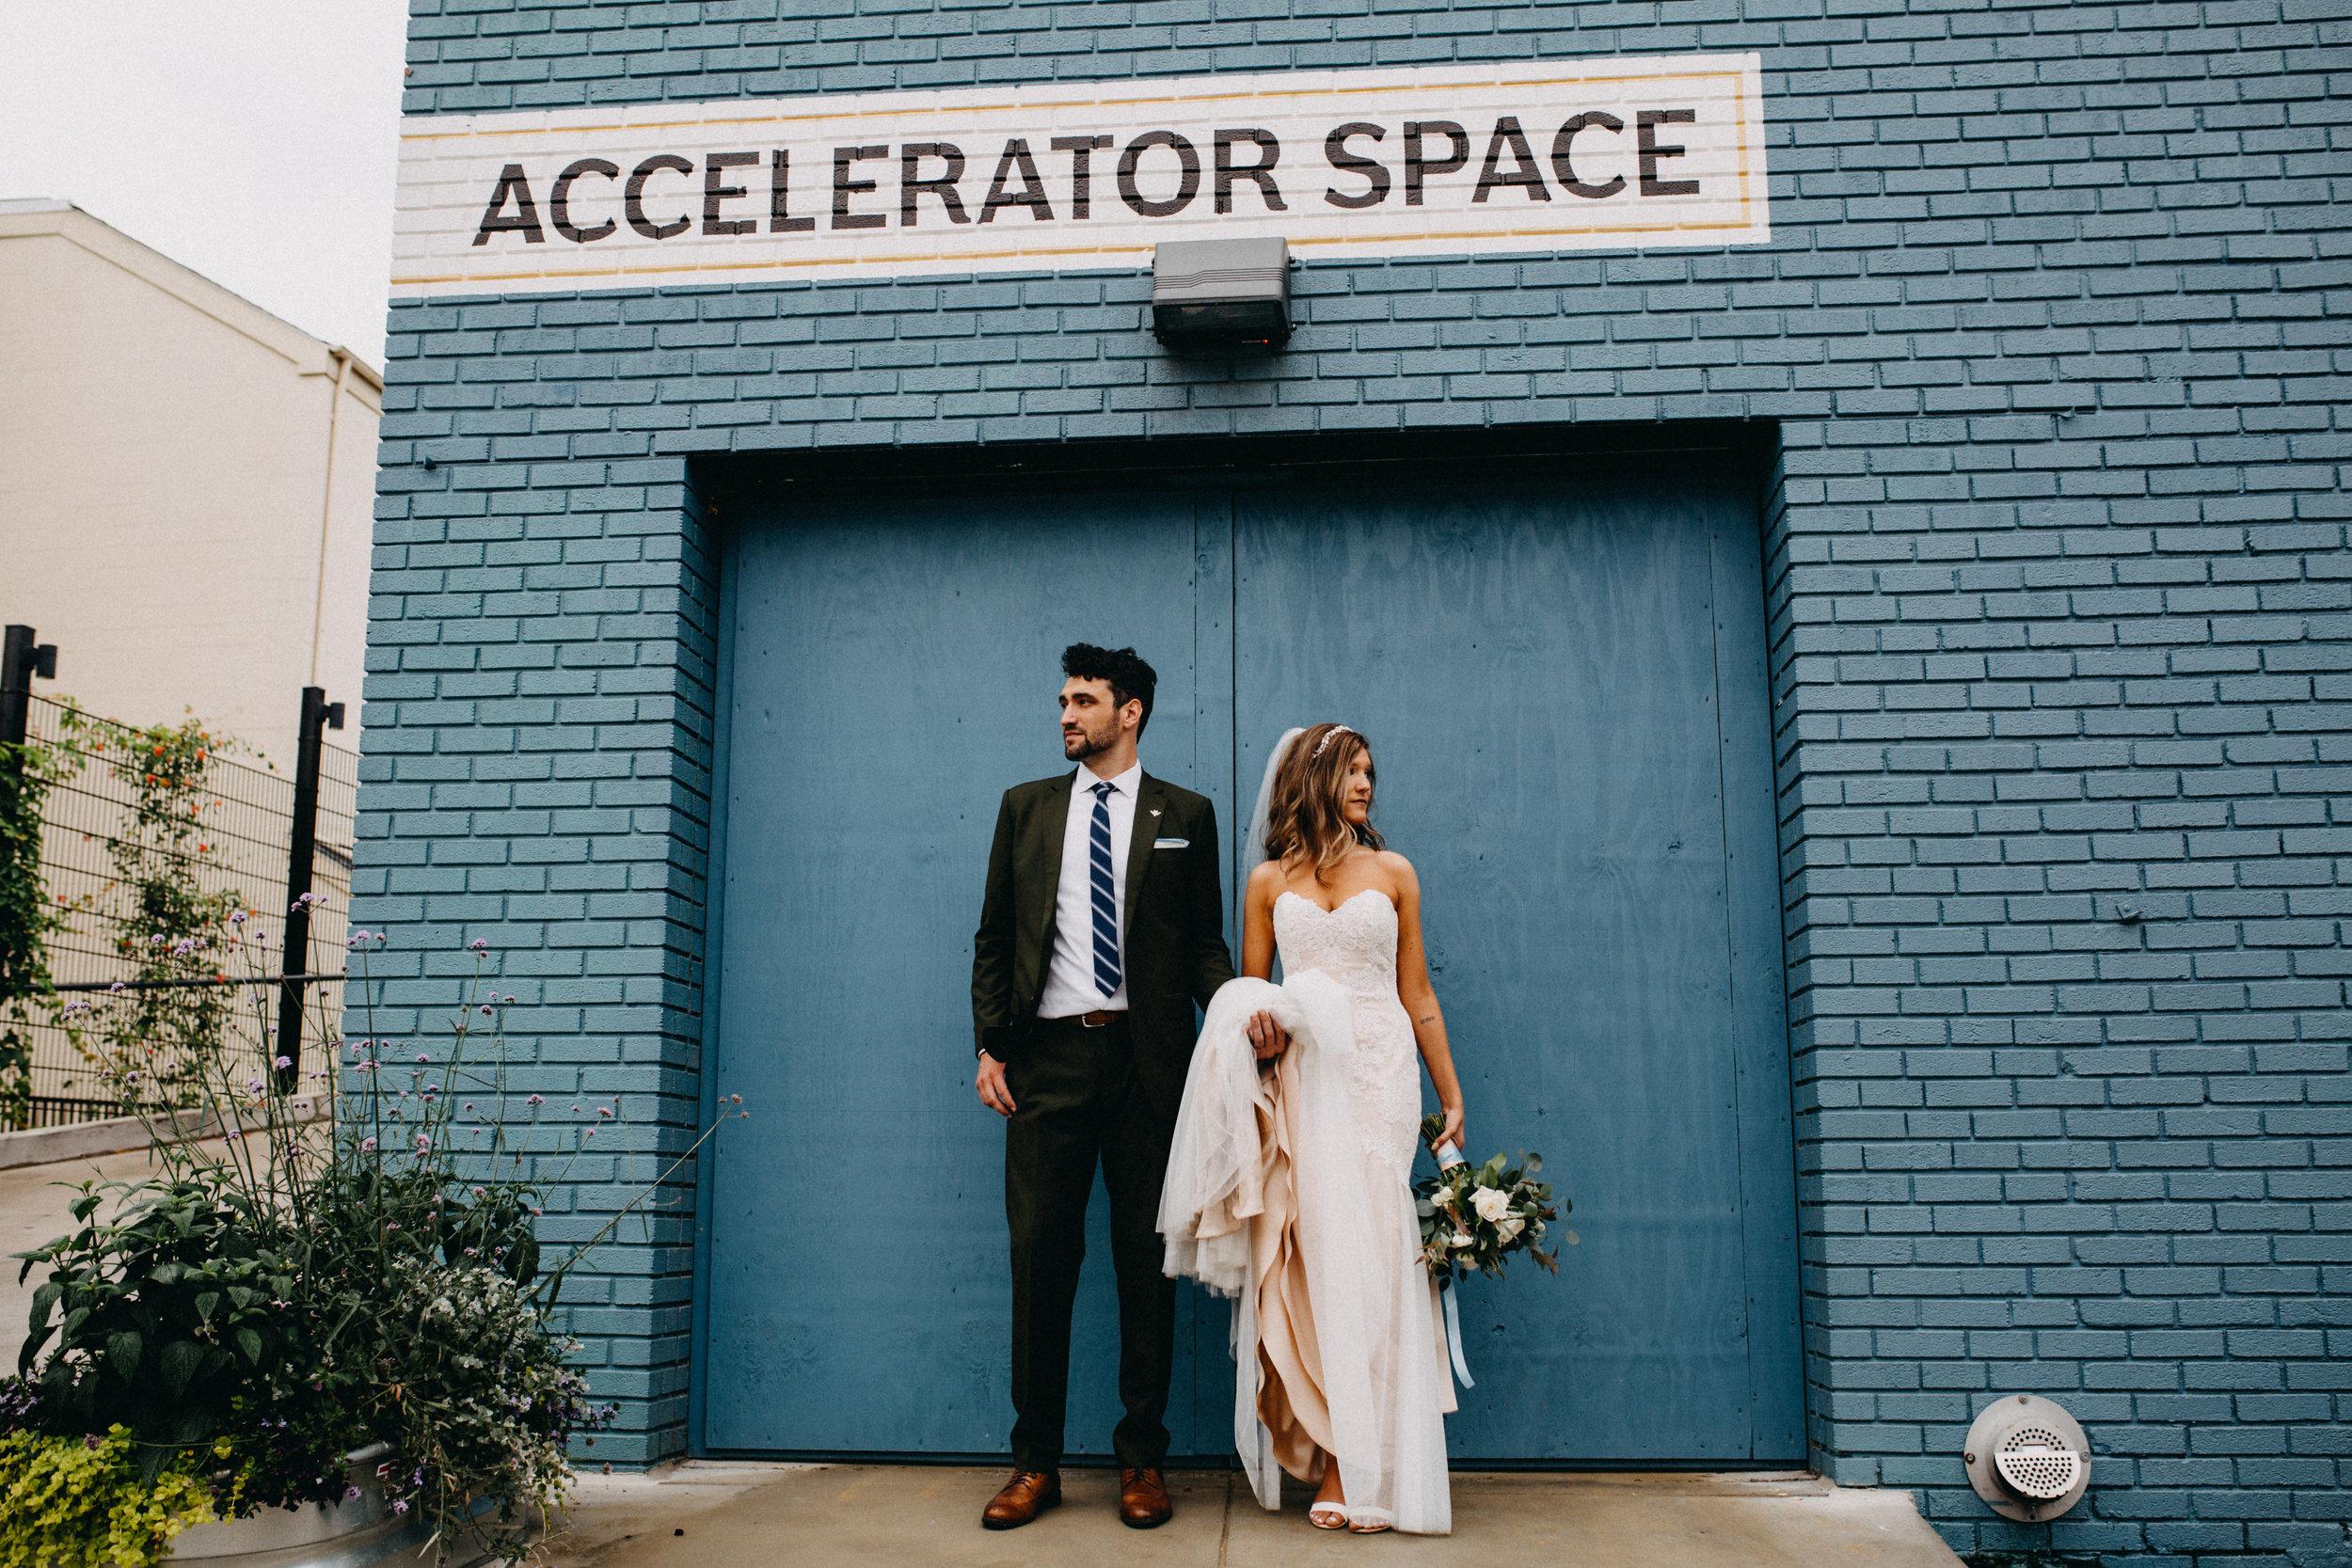 Accelerator Space Wedding